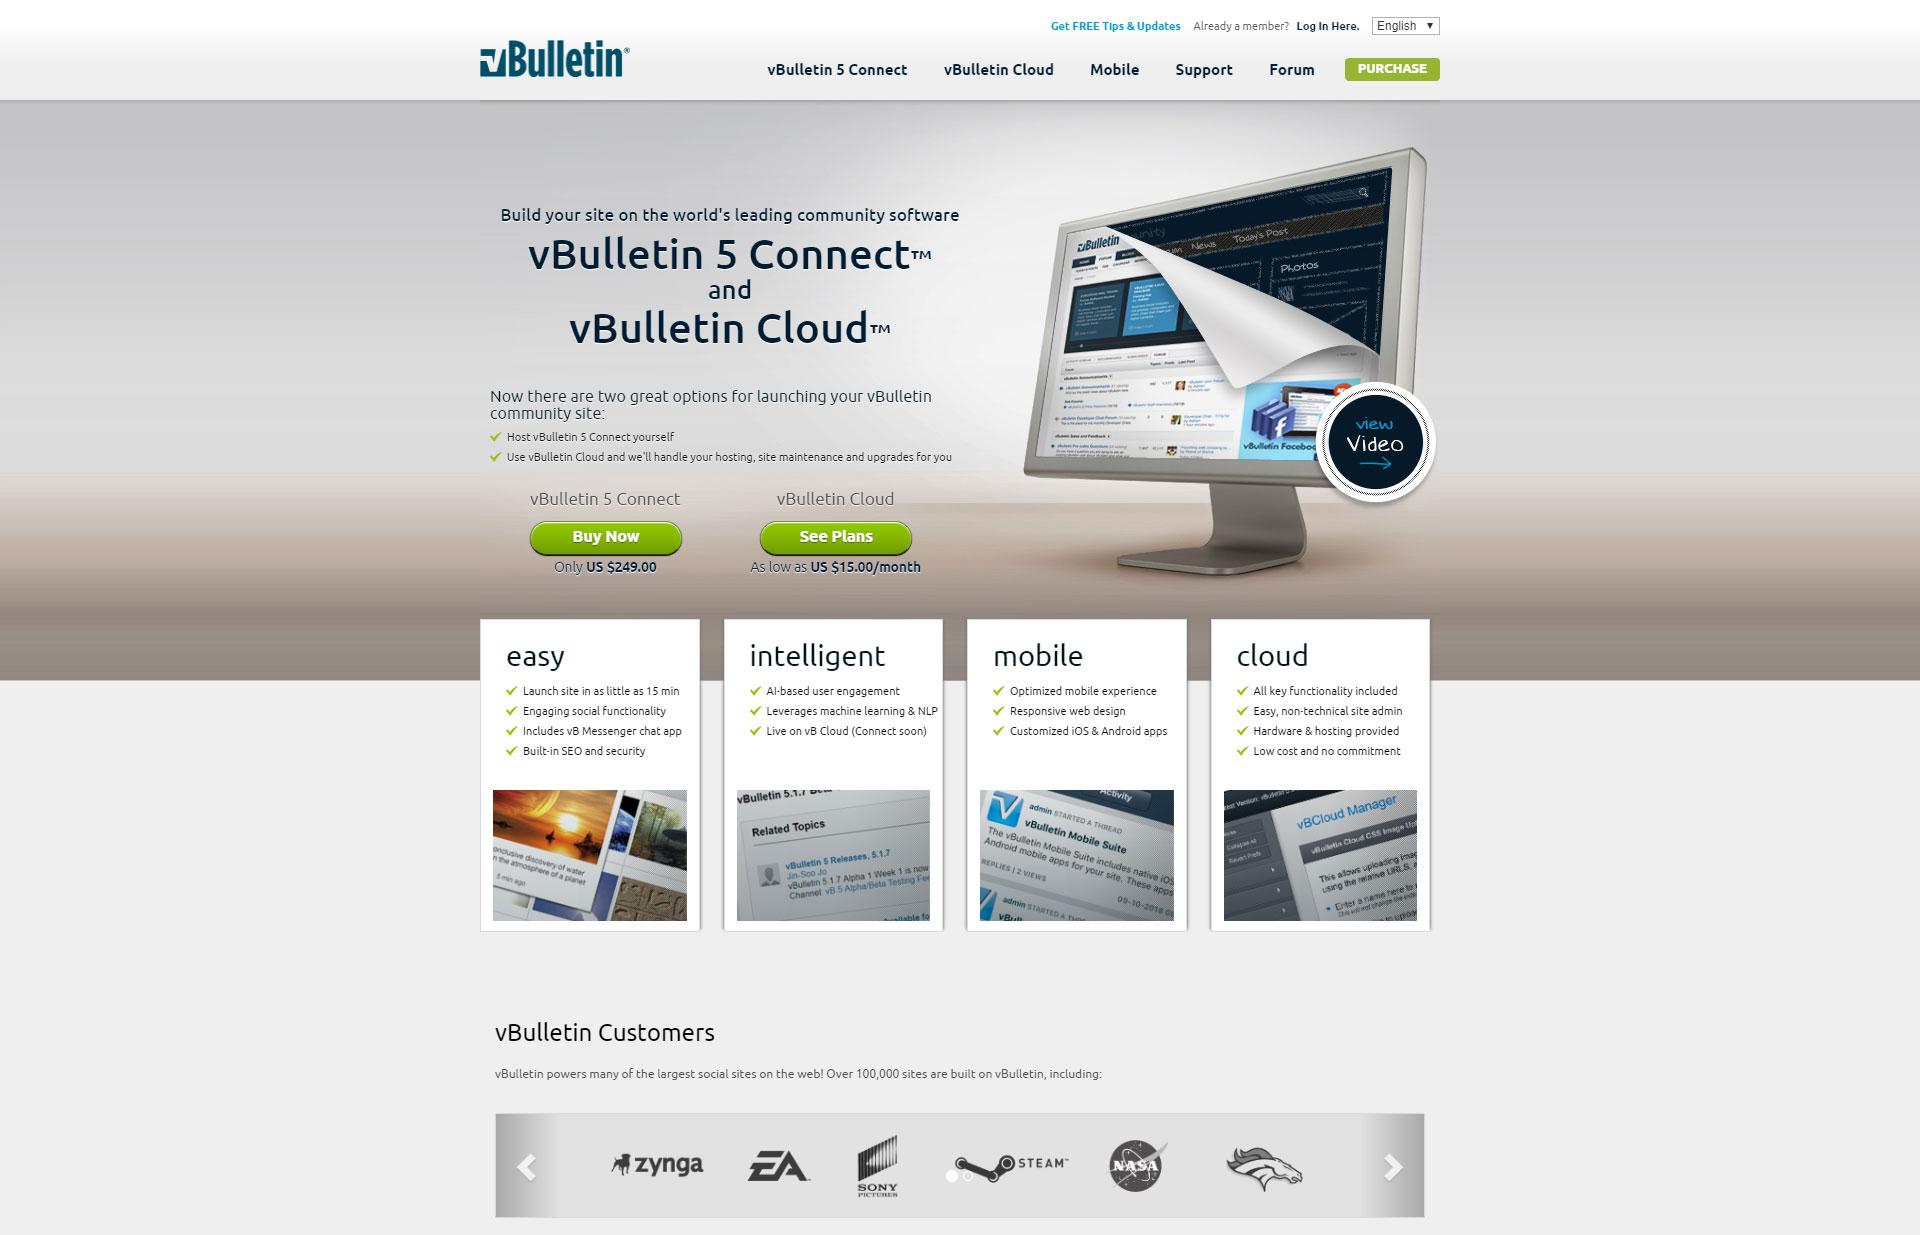 vBulletin - Best Free Content Management System